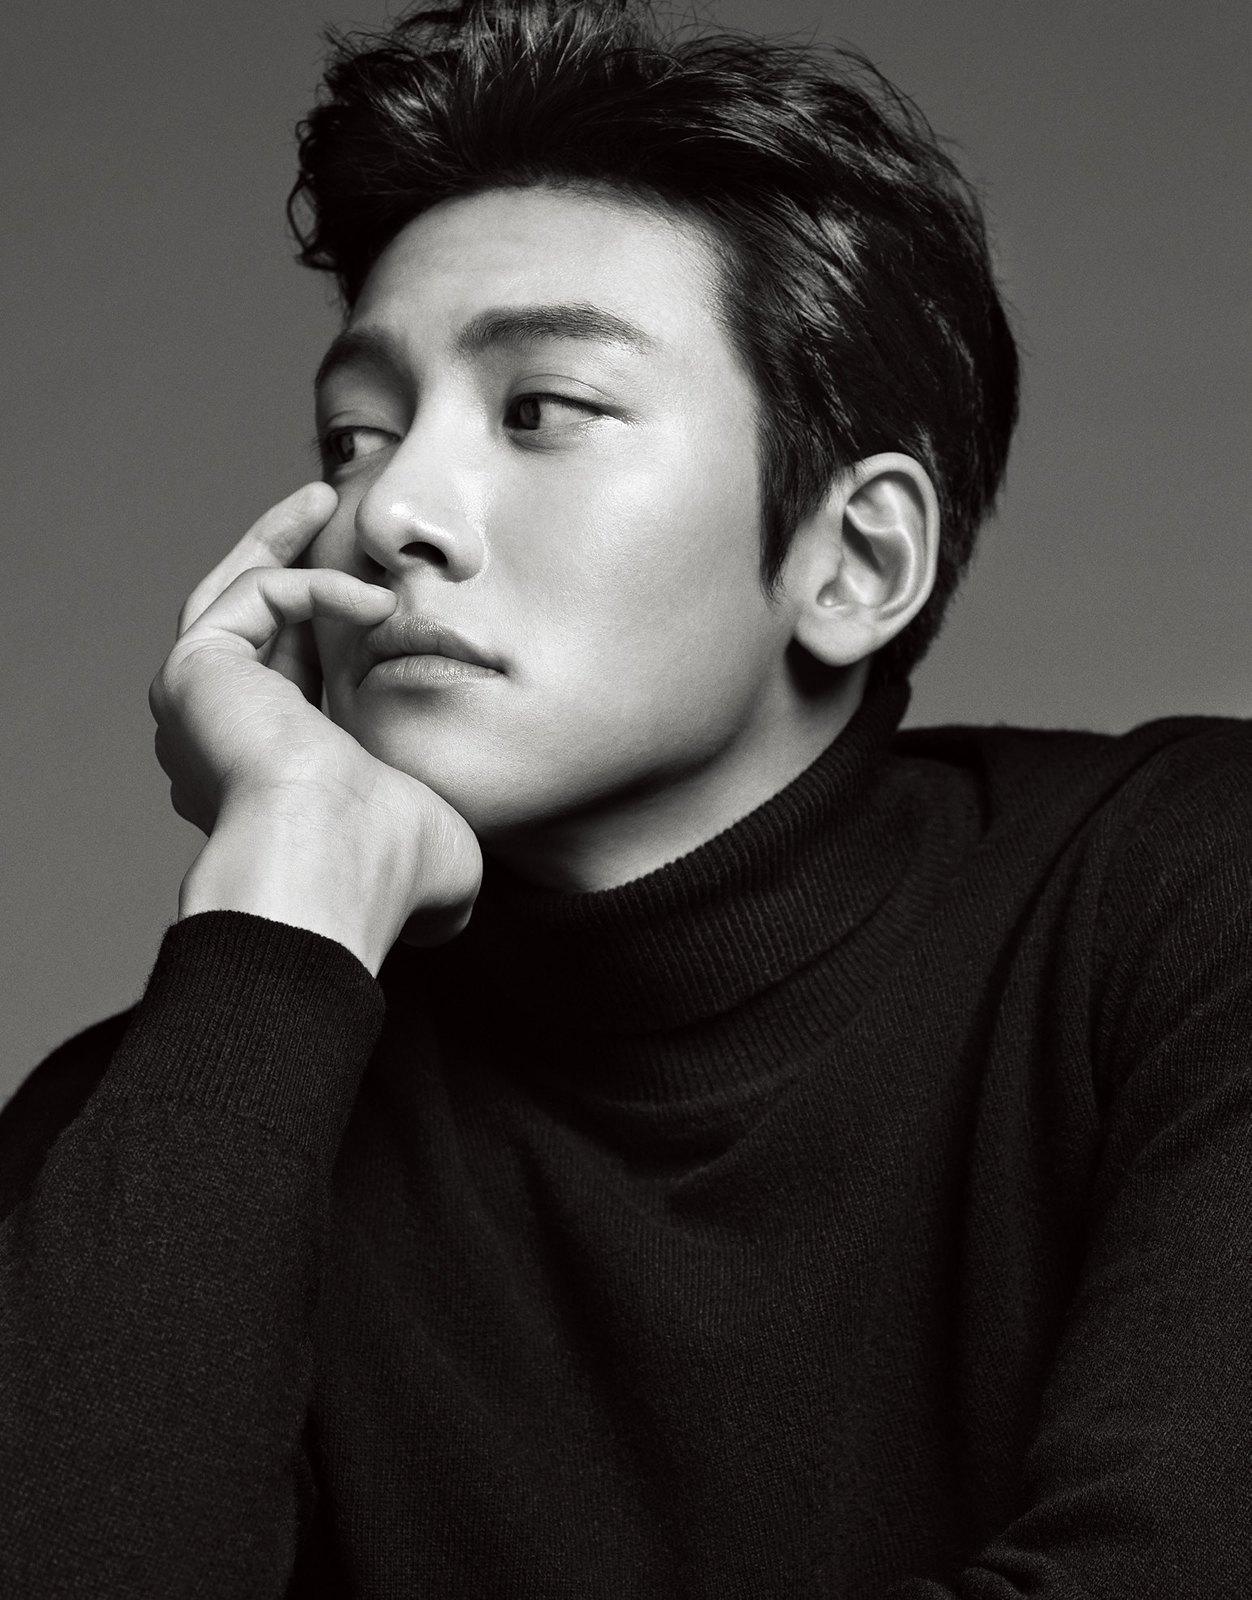 Delightful Ji Chang Wook: A Sophisticated Gentleman In JLook ·  A6ec37a8jw1fac81xb1v9j216u1irdz4